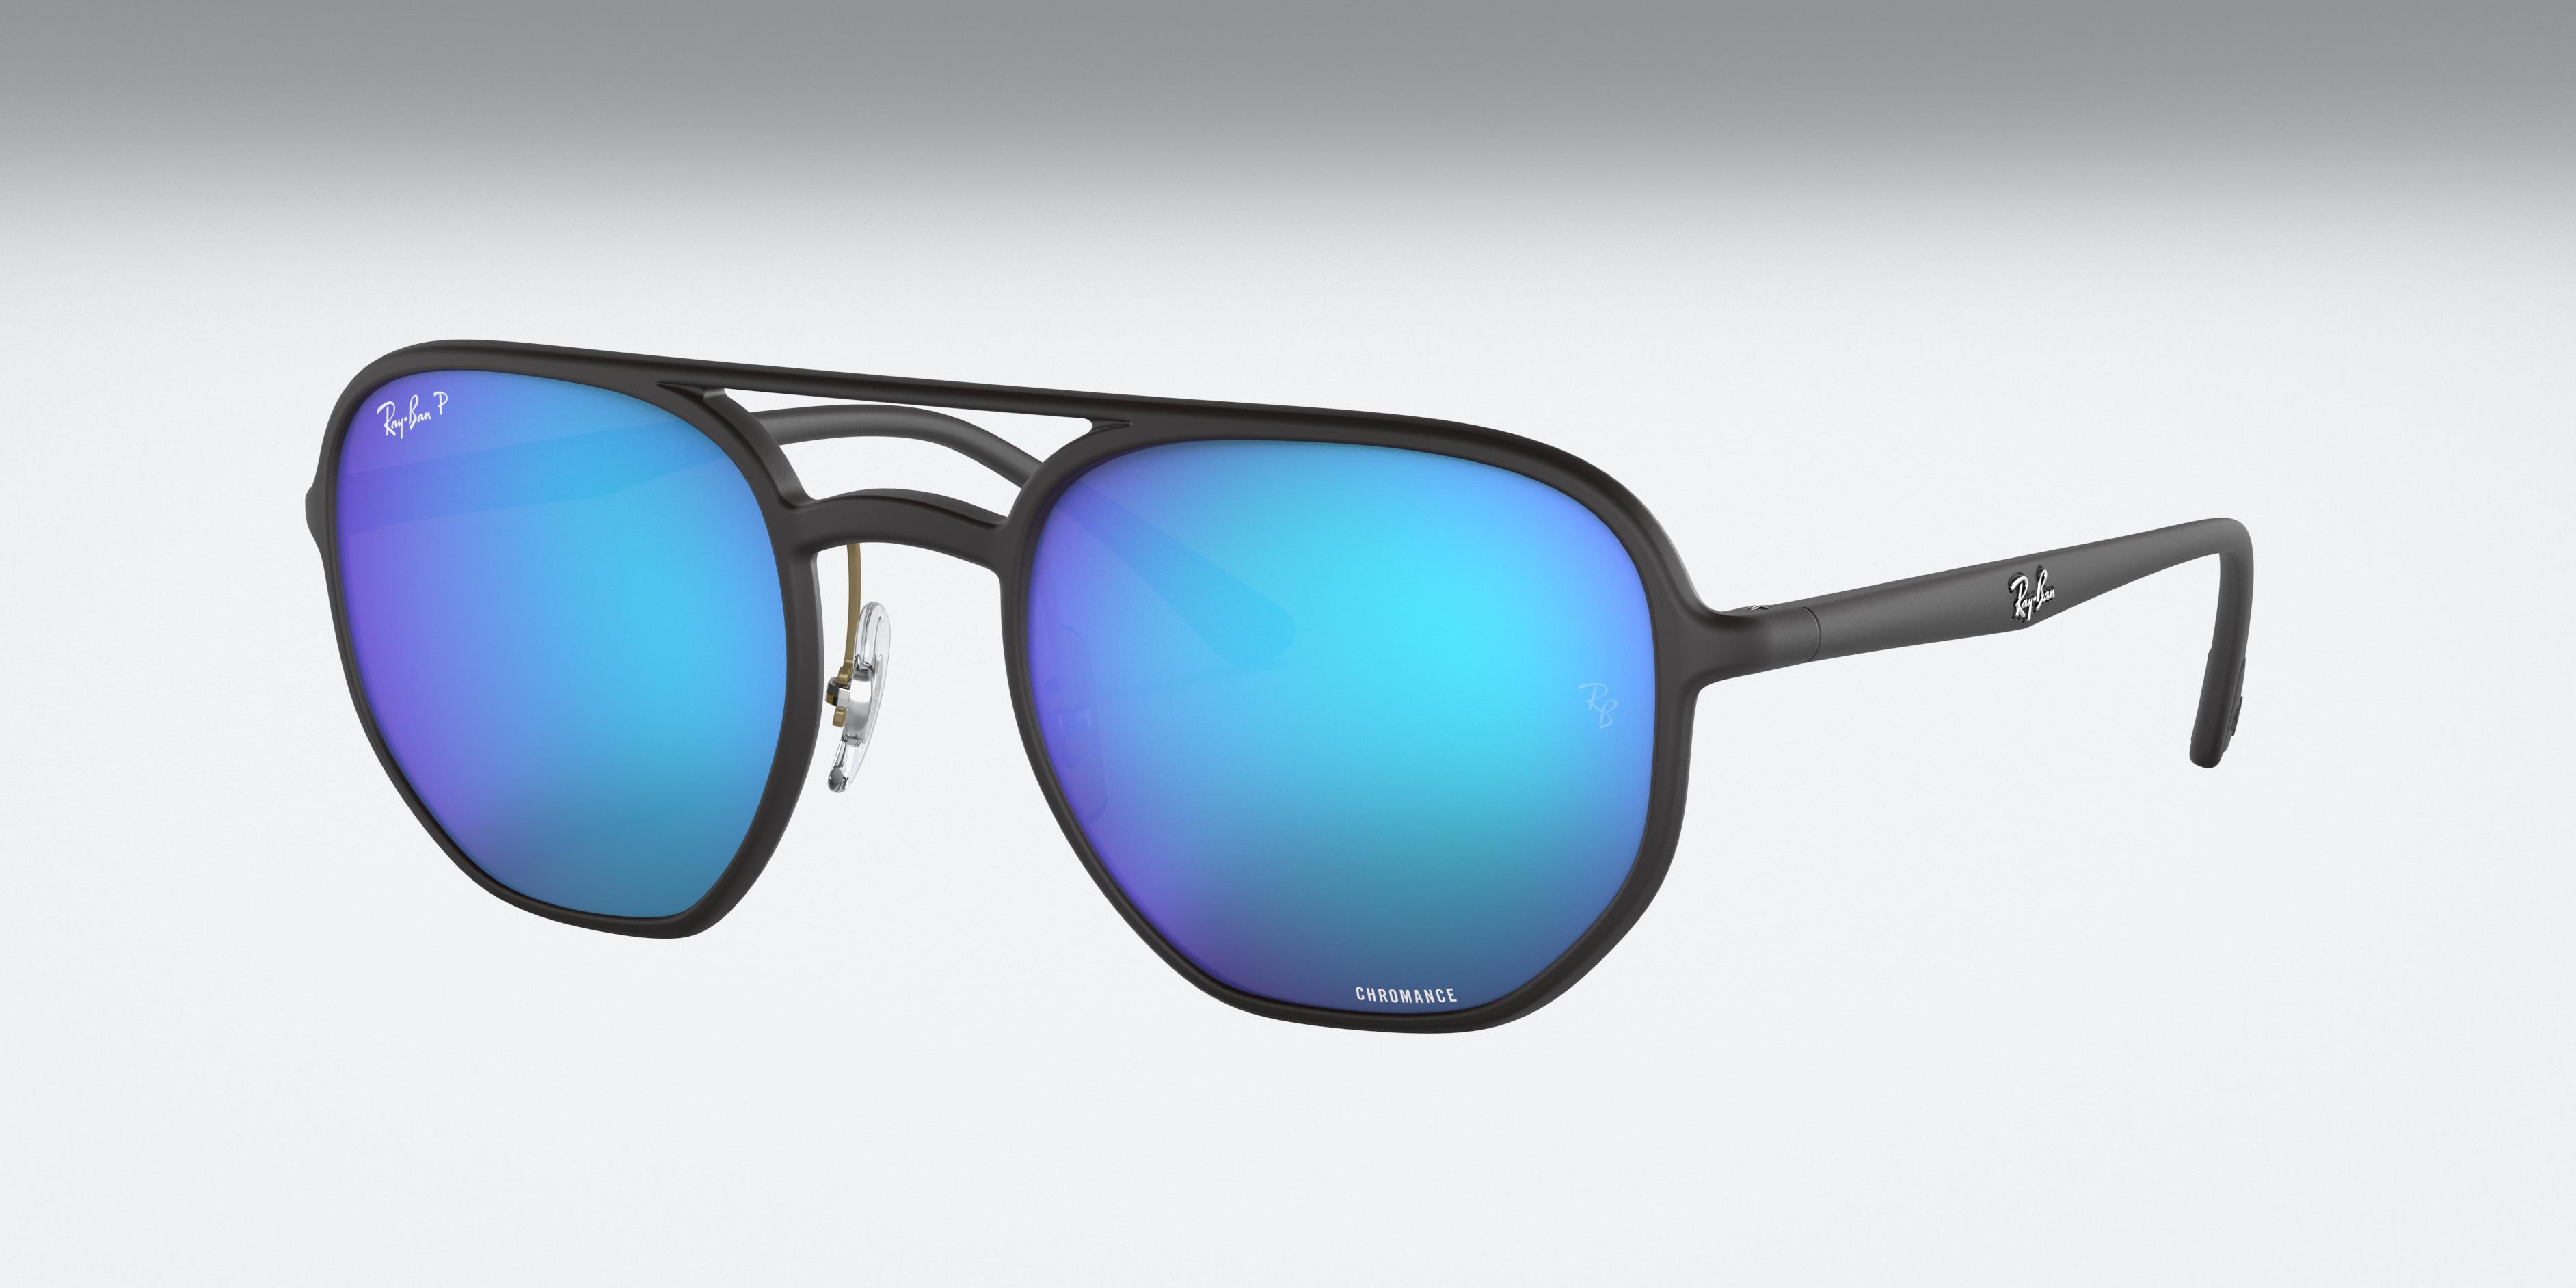 Ray-Ban Rb4321 Chromance Black, Polarized Blue Lenses - RB4321CH